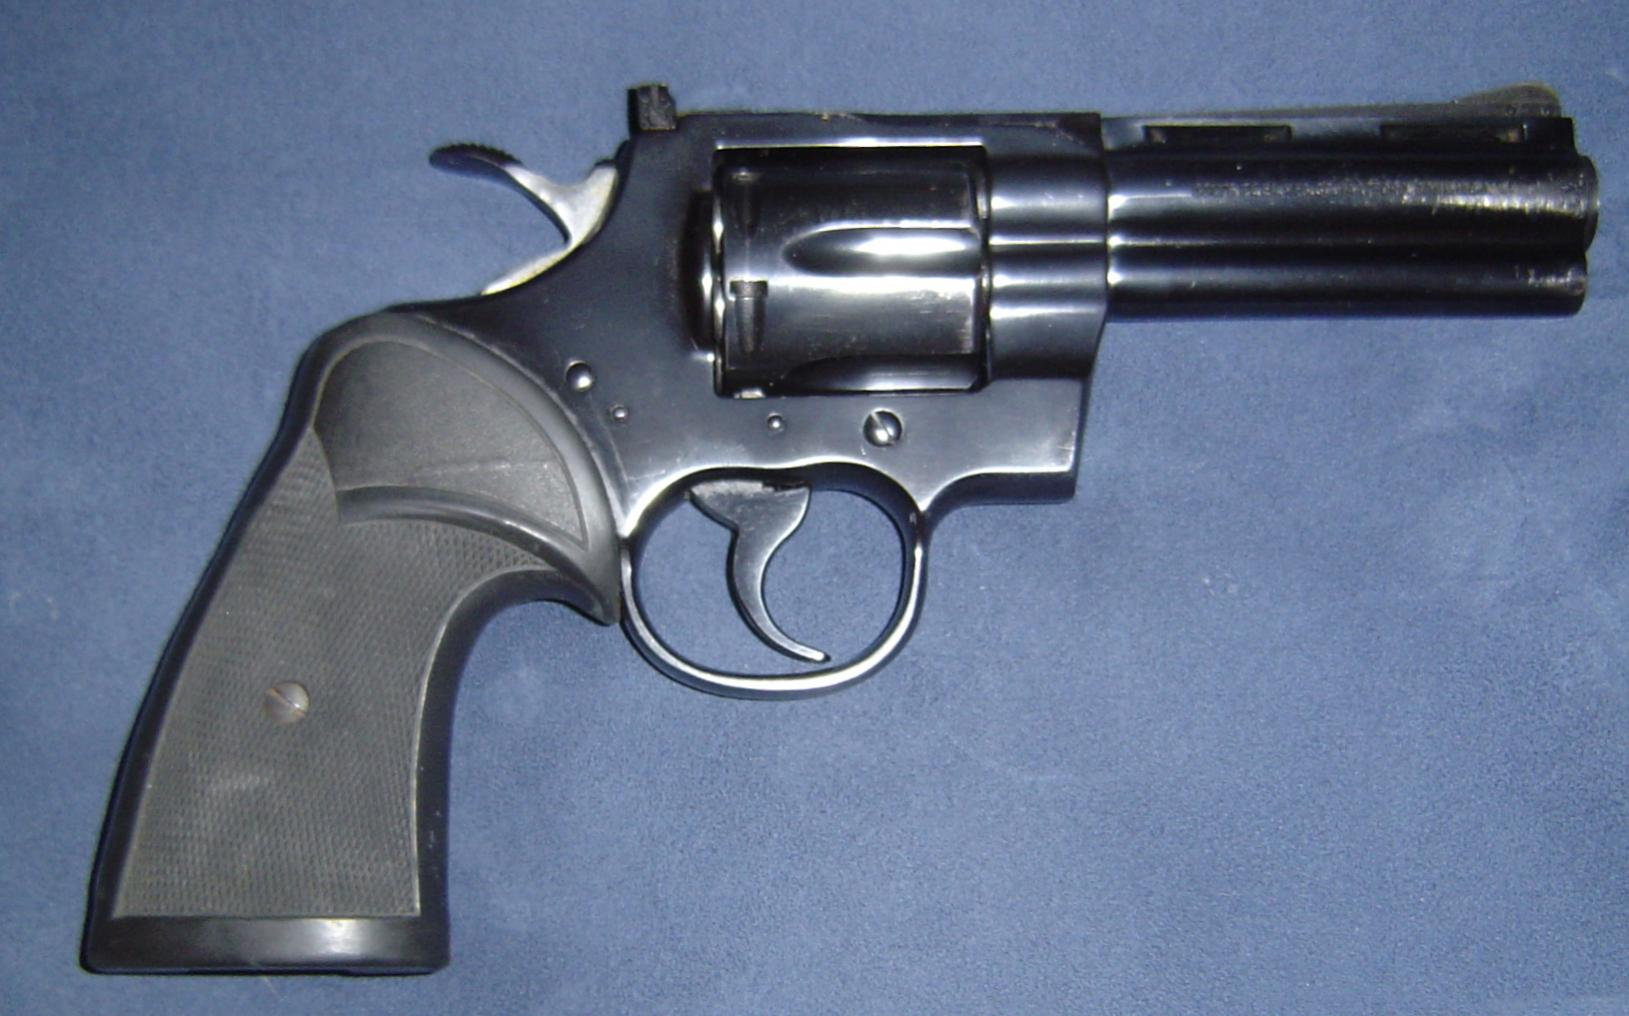 1977 Colt Python-dsc00105.jpg